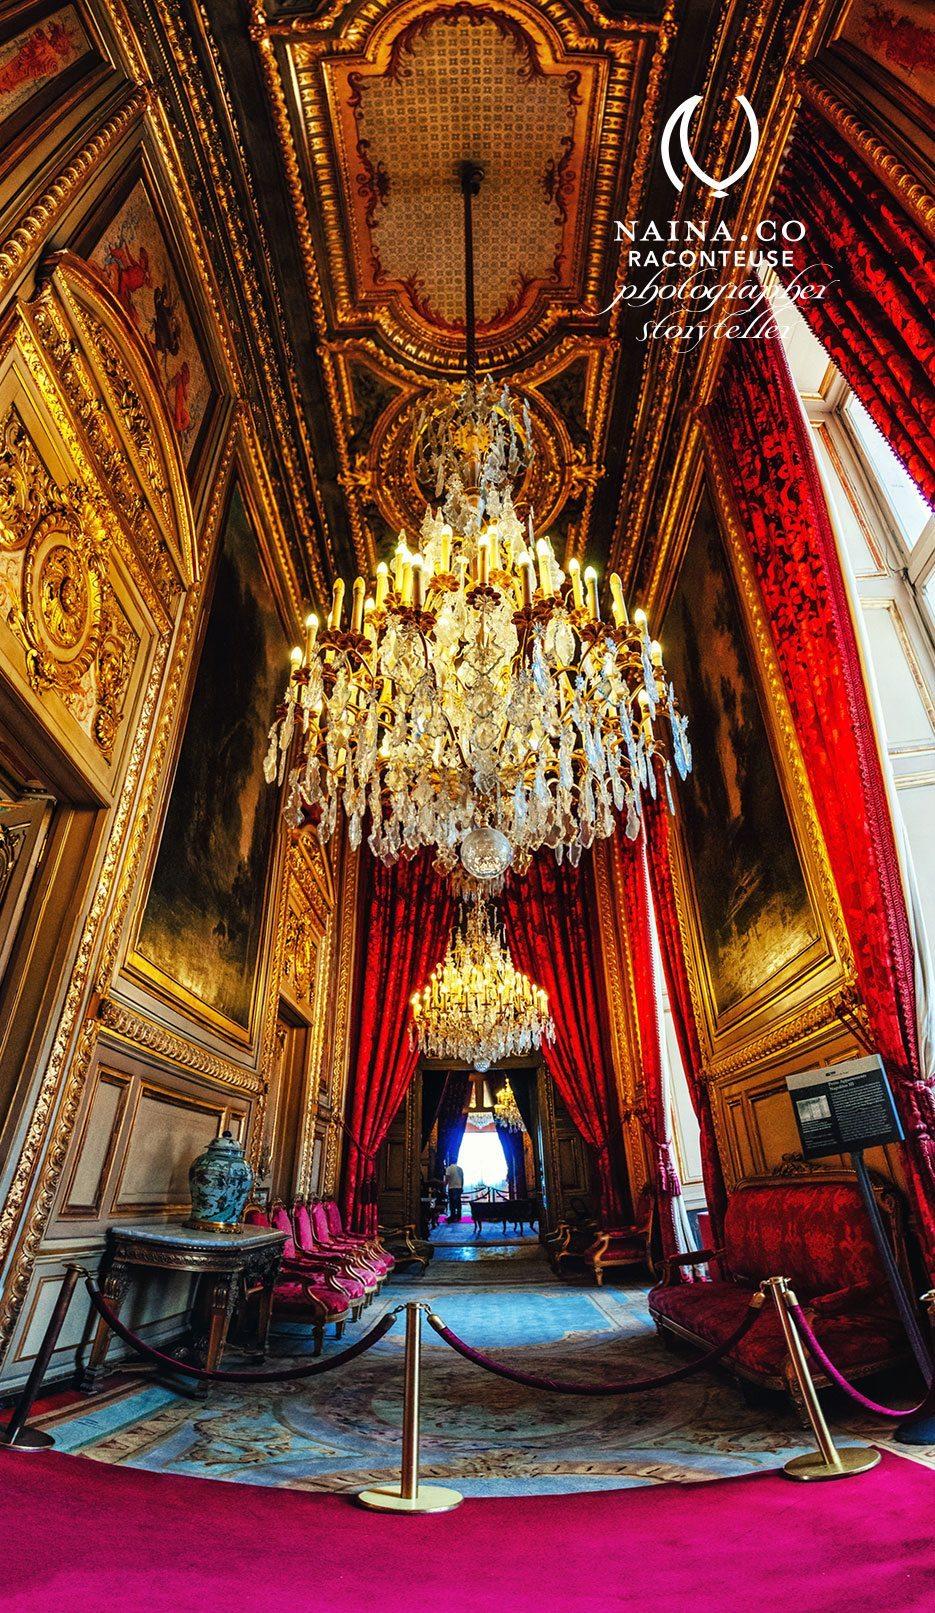 Naina.co-Louvre-Museum-Paris-France-EyesForParis-Raconteuse-Storyteller-Photographer-Blogger-Luxury-Lifestyle-081